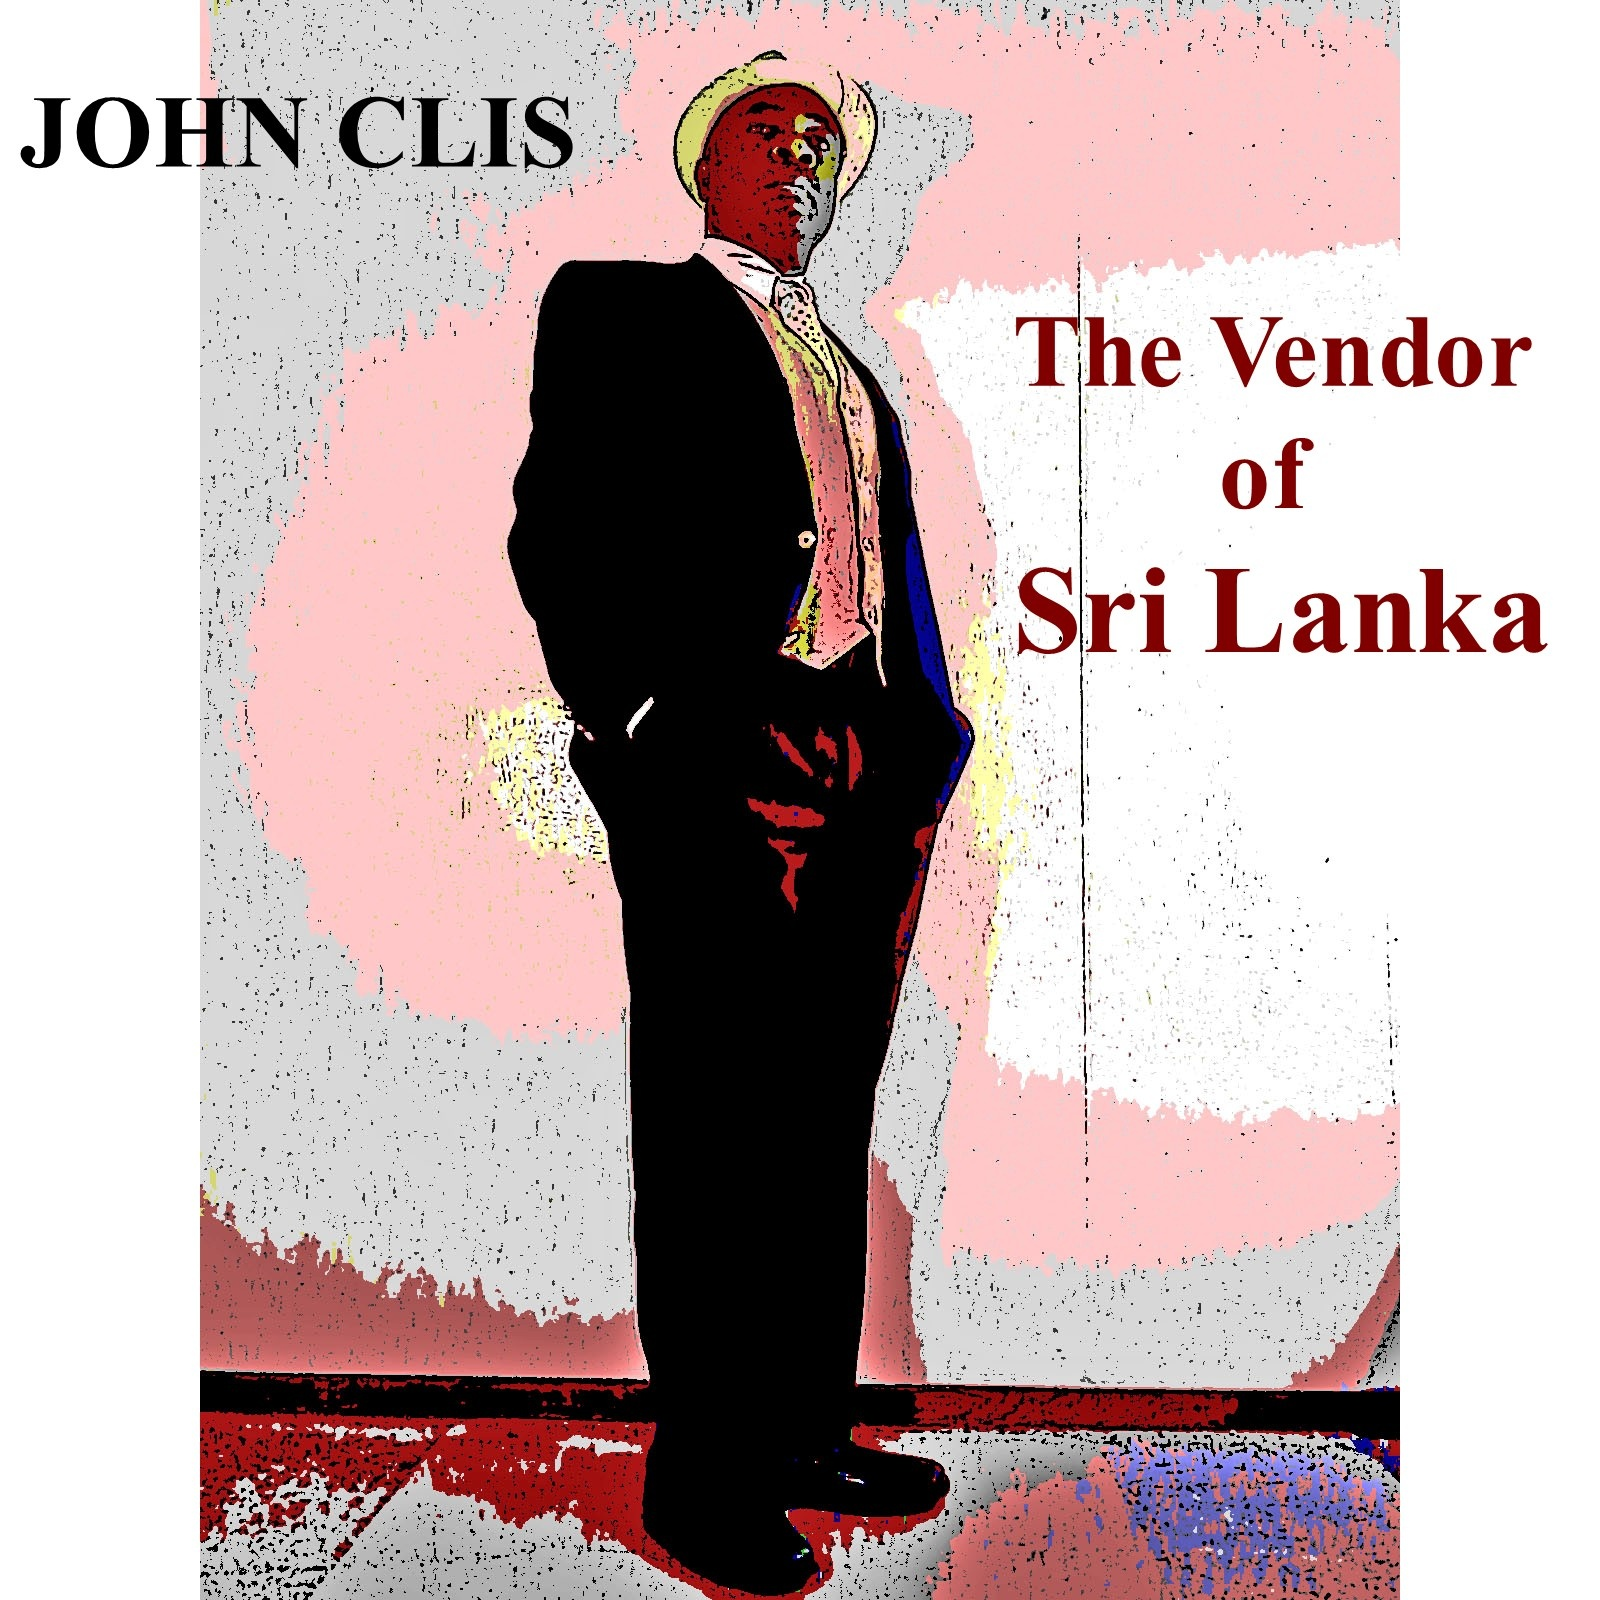 https://0201.nccdn.net/4_2/000/000/038/2d3/John-Clis---The-Vendor-of-Sri-Lanka---Pic-1-1600x1600.jpg